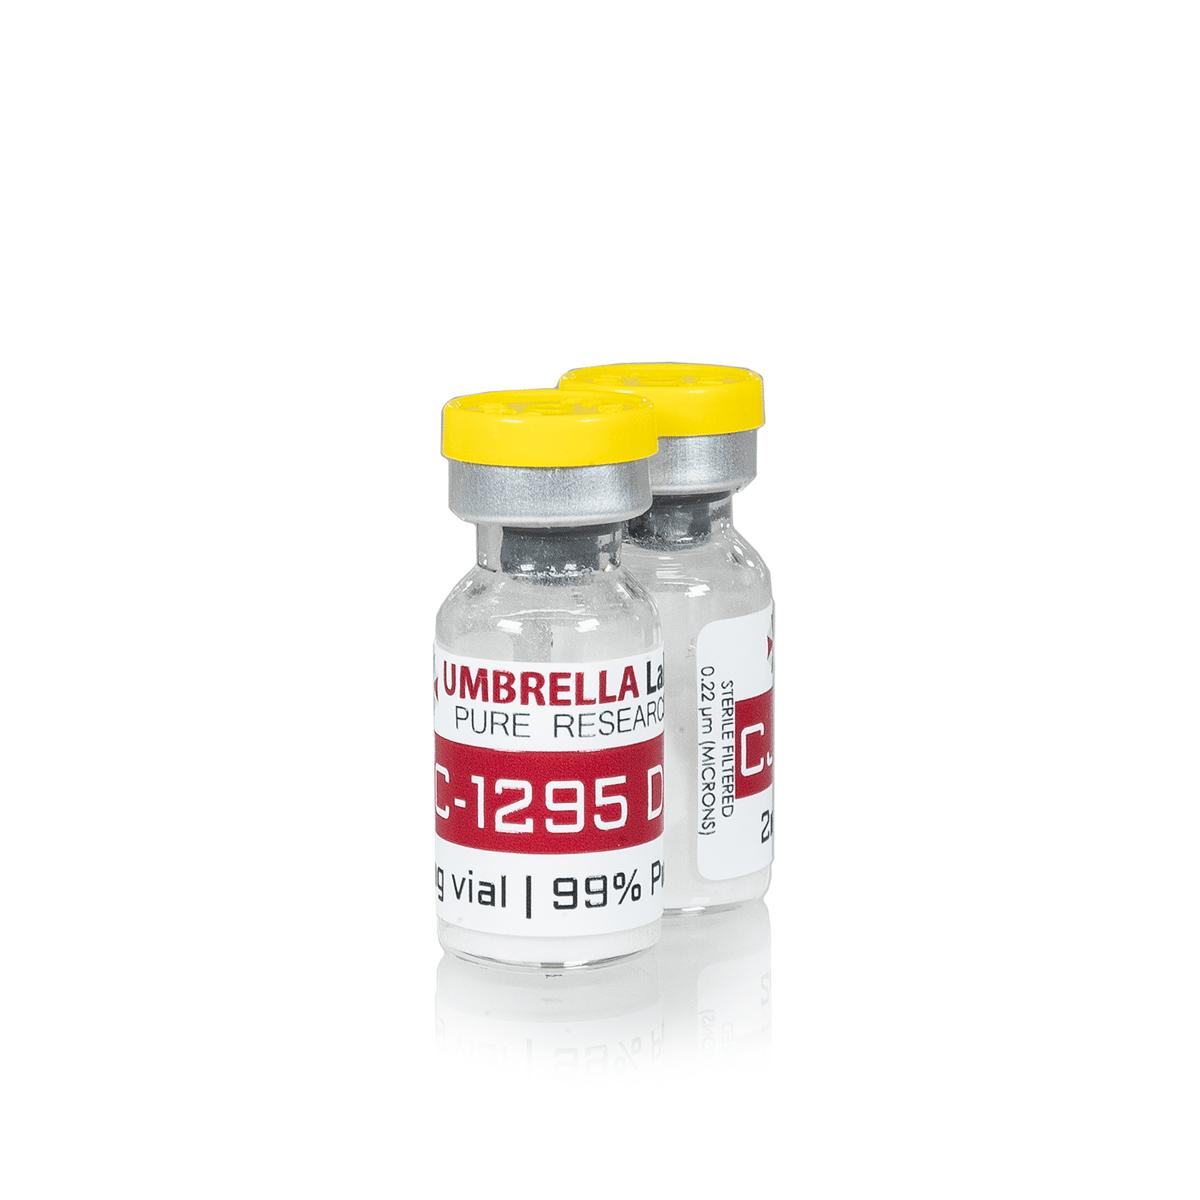 CJC-1295 DAC PEPTIDE 2MG VIAL